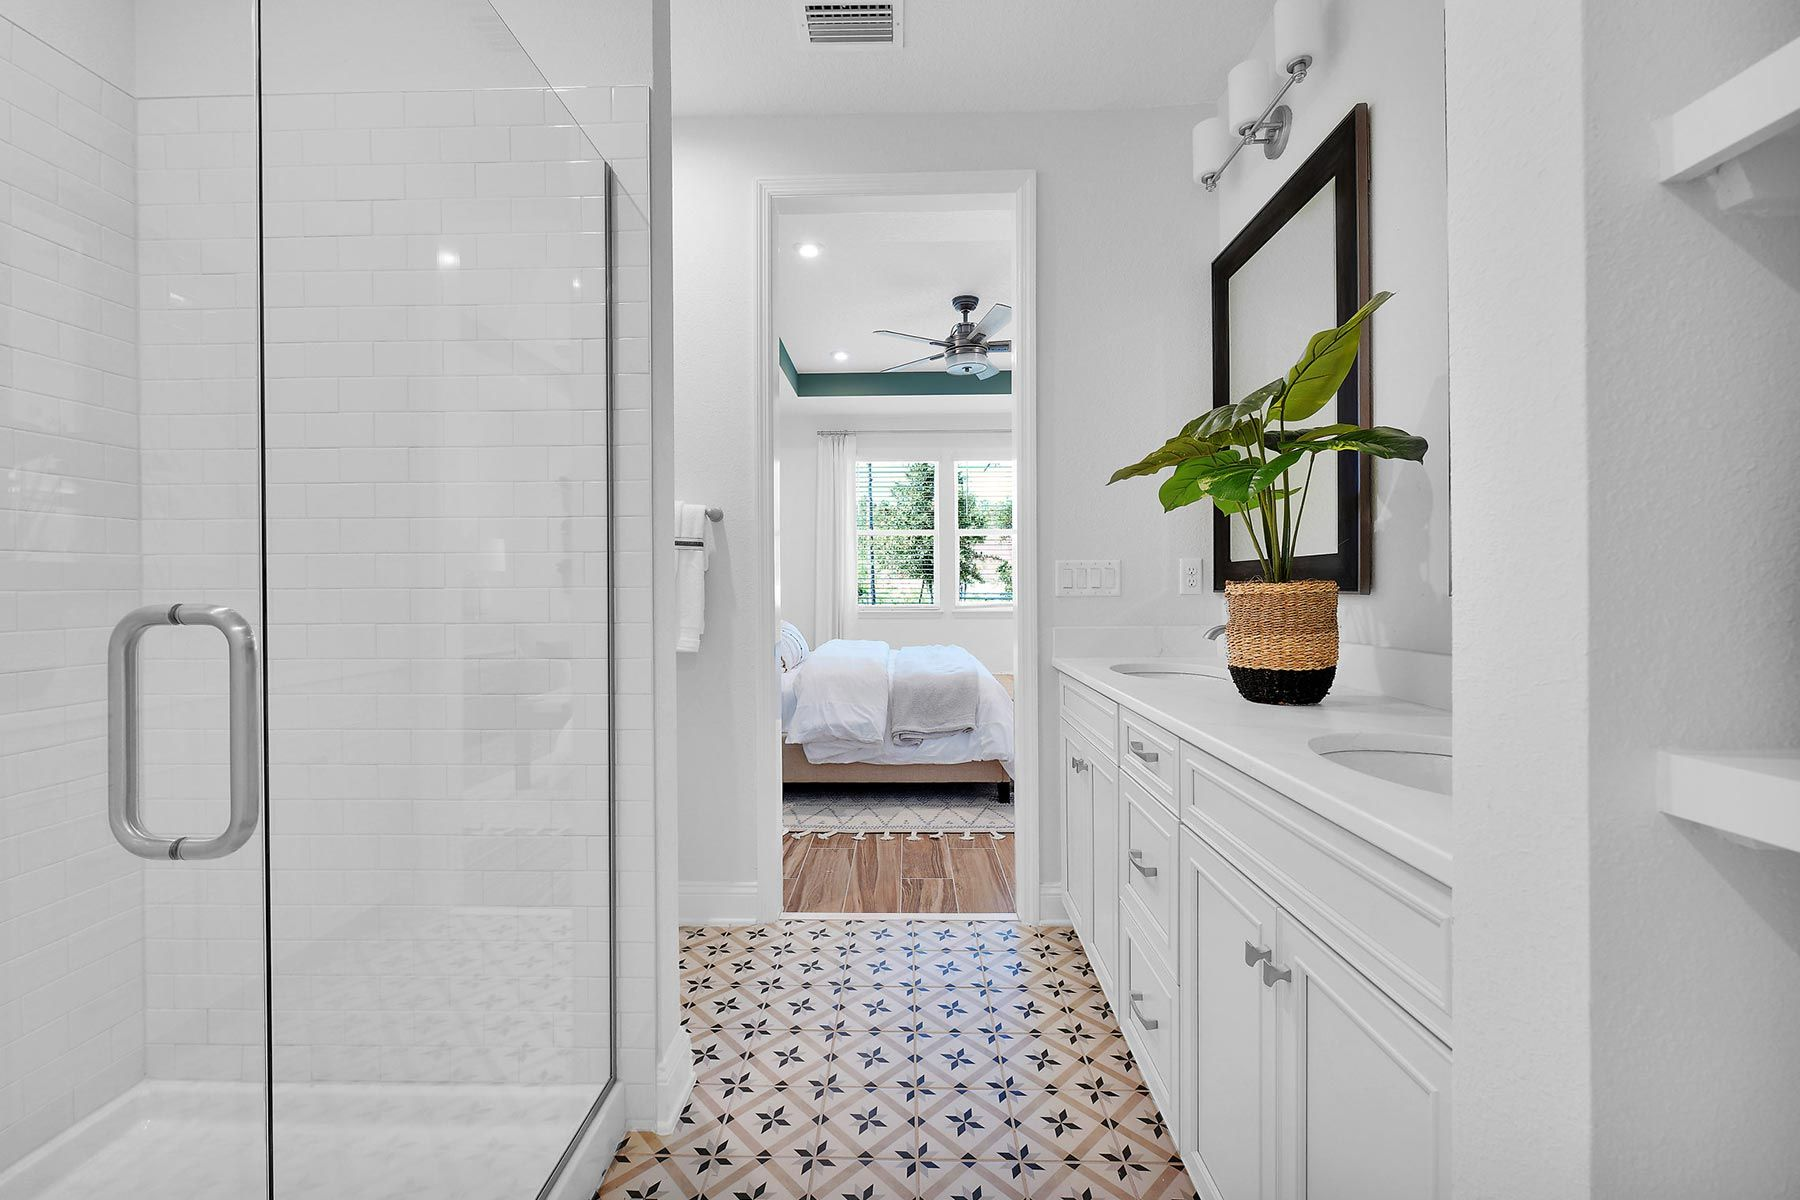 Jacksonville - Pablo Cove:Darya Model Owners Bath